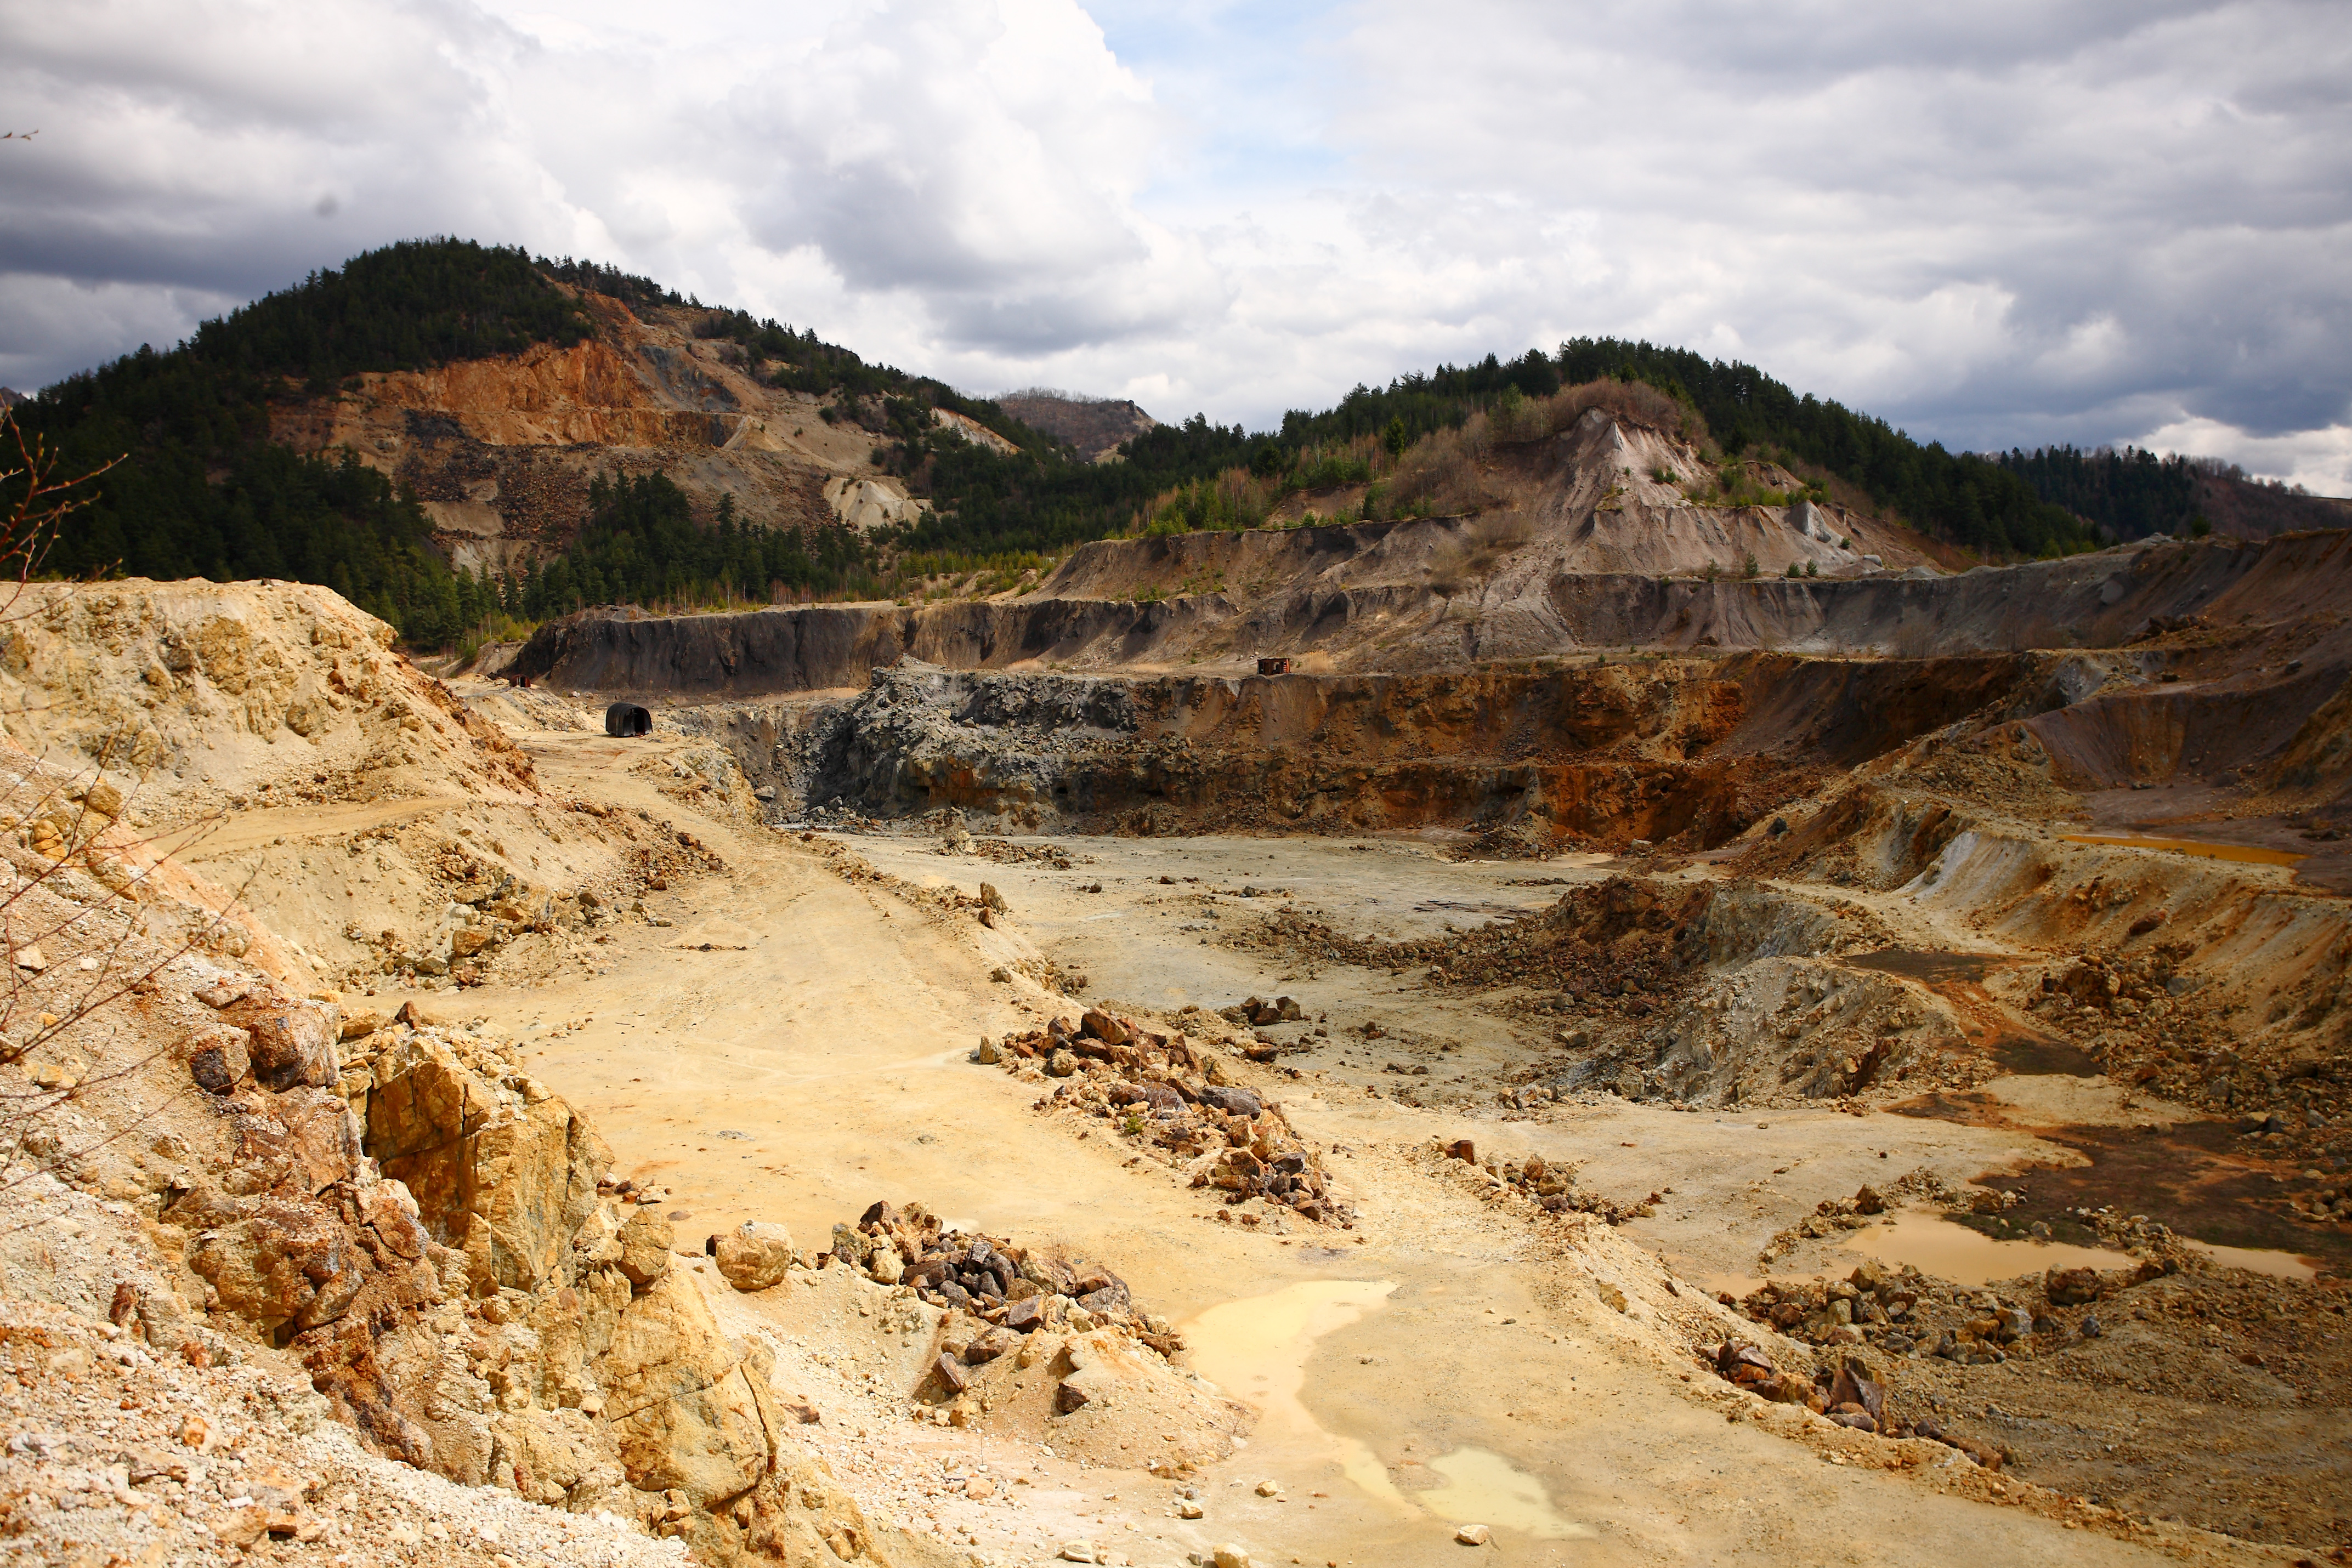 Comisia Parlamentara speciala a respins proiectul privind exploatarea miniera de la Rosia Montana